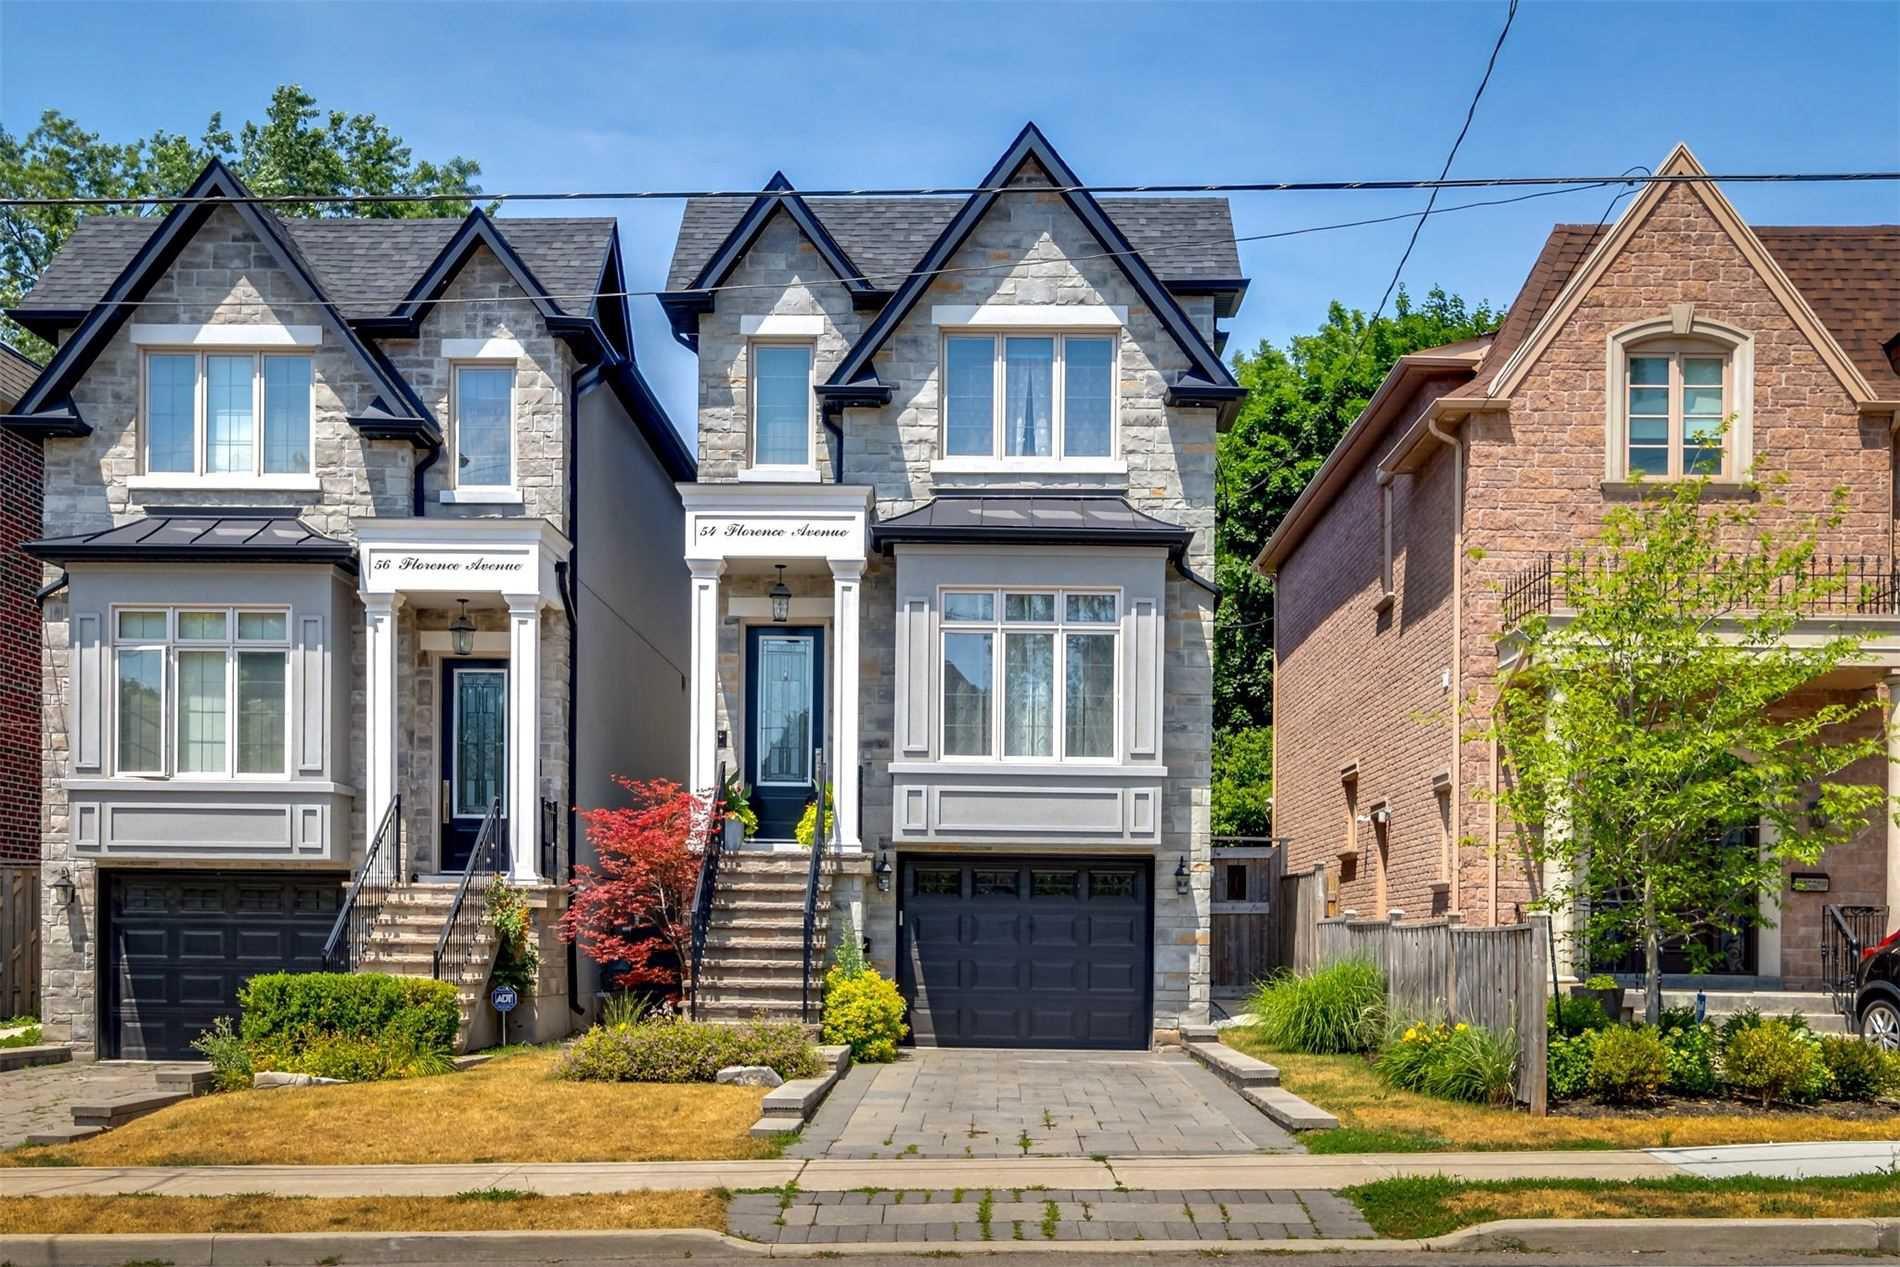 Main Photo: 54 Florence Avenue in Toronto: Lansing-Westgate House (2-Storey) for lease (Toronto C07)  : MLS®# C4838223